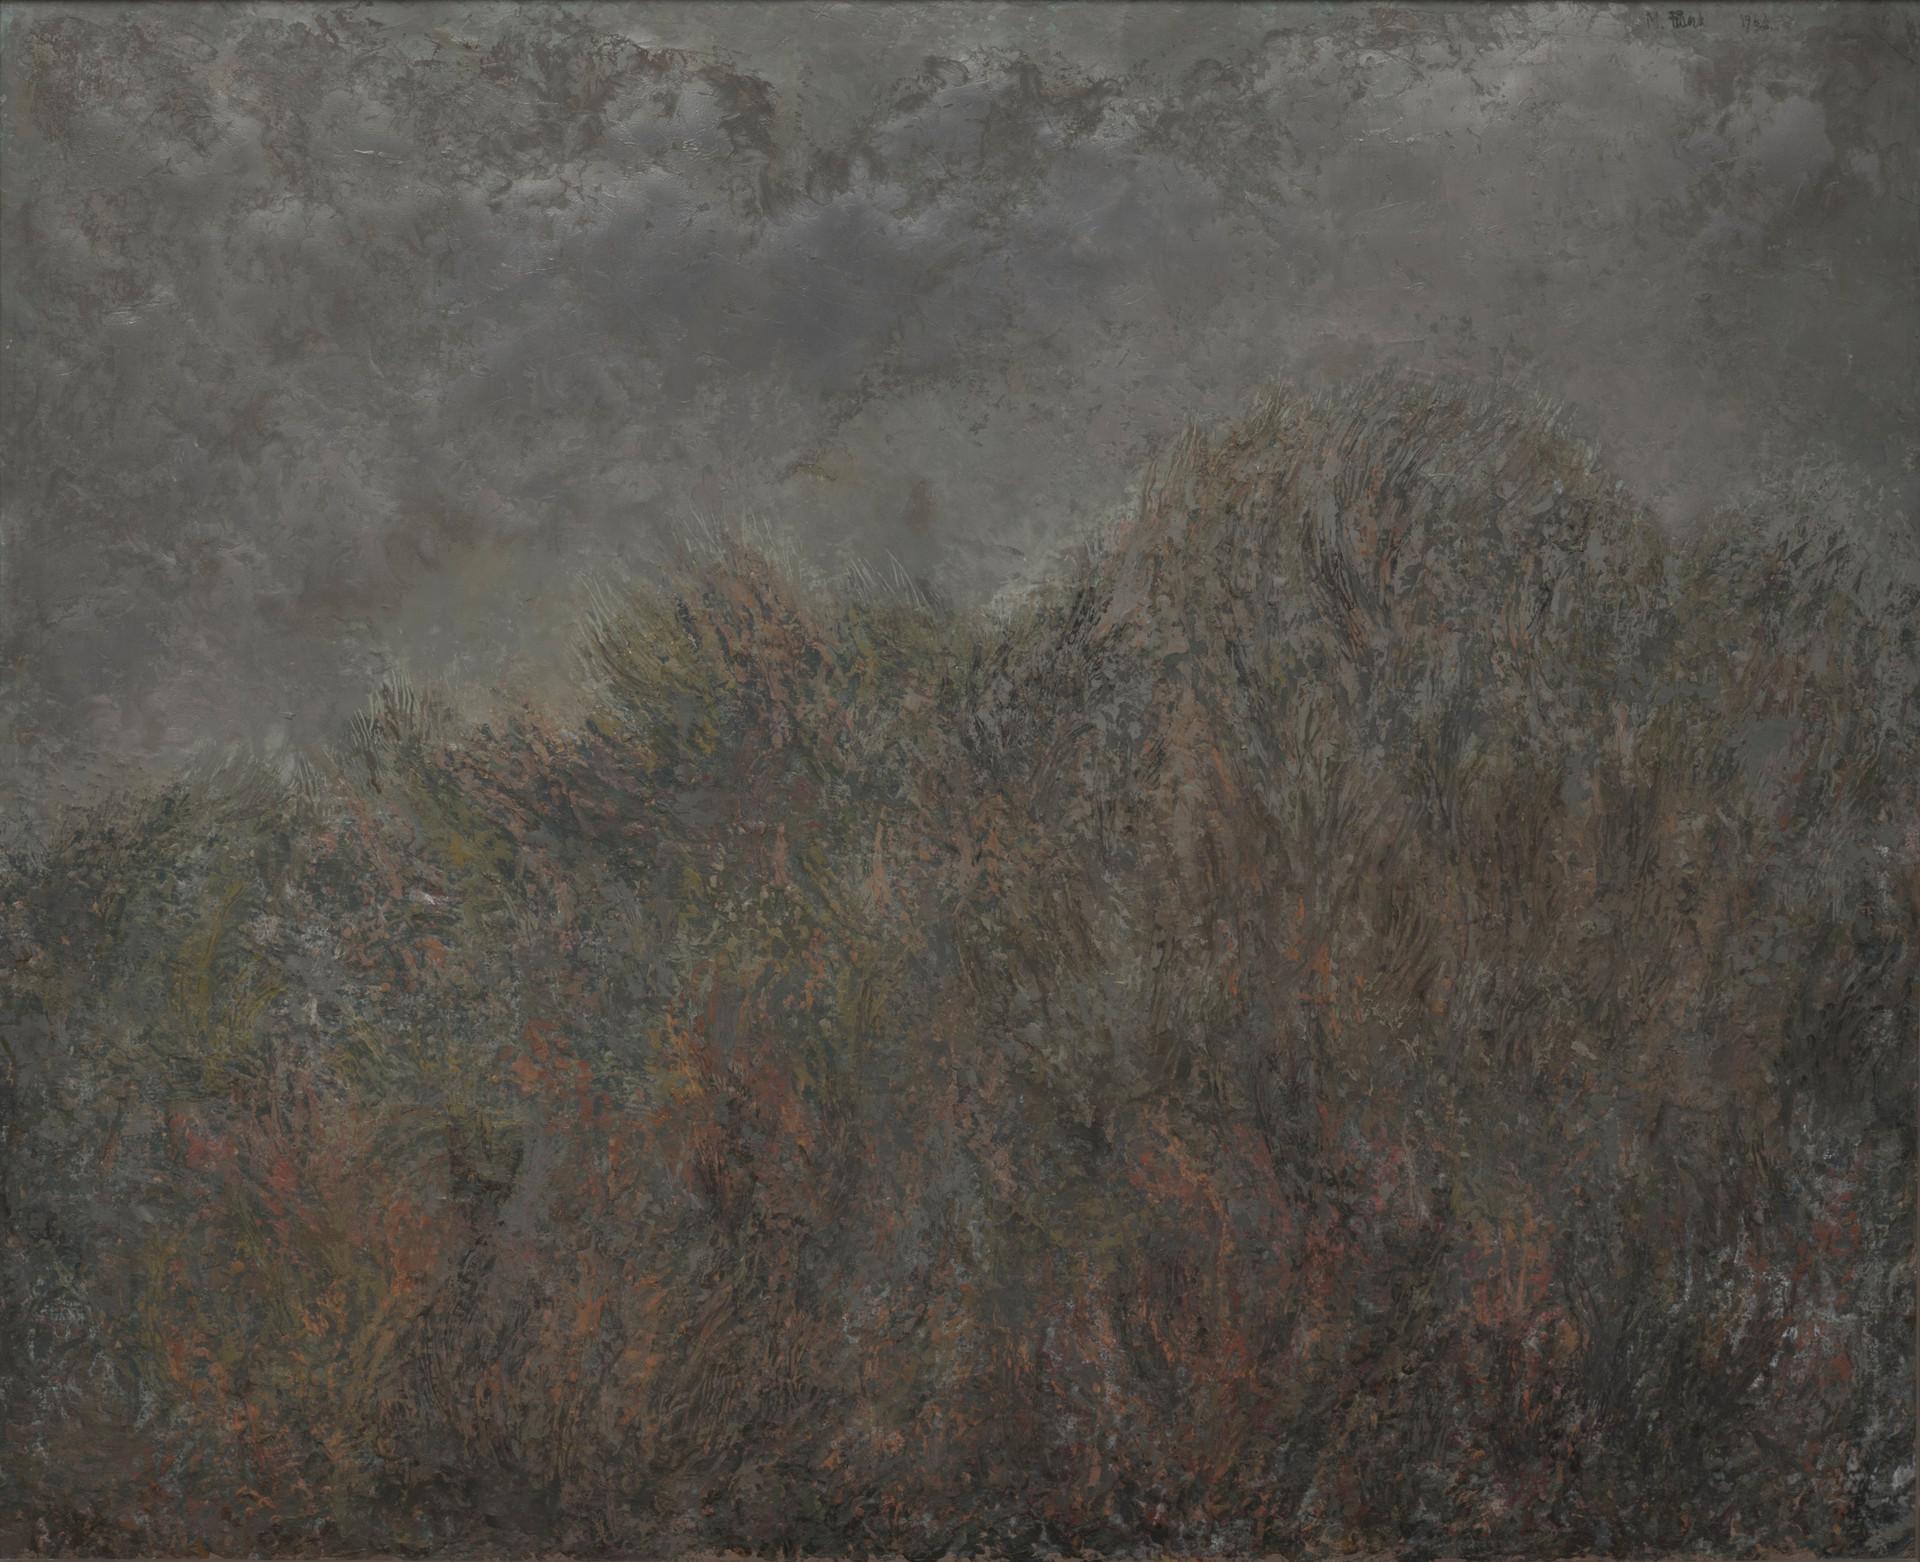 Untitled - dark gray landscape